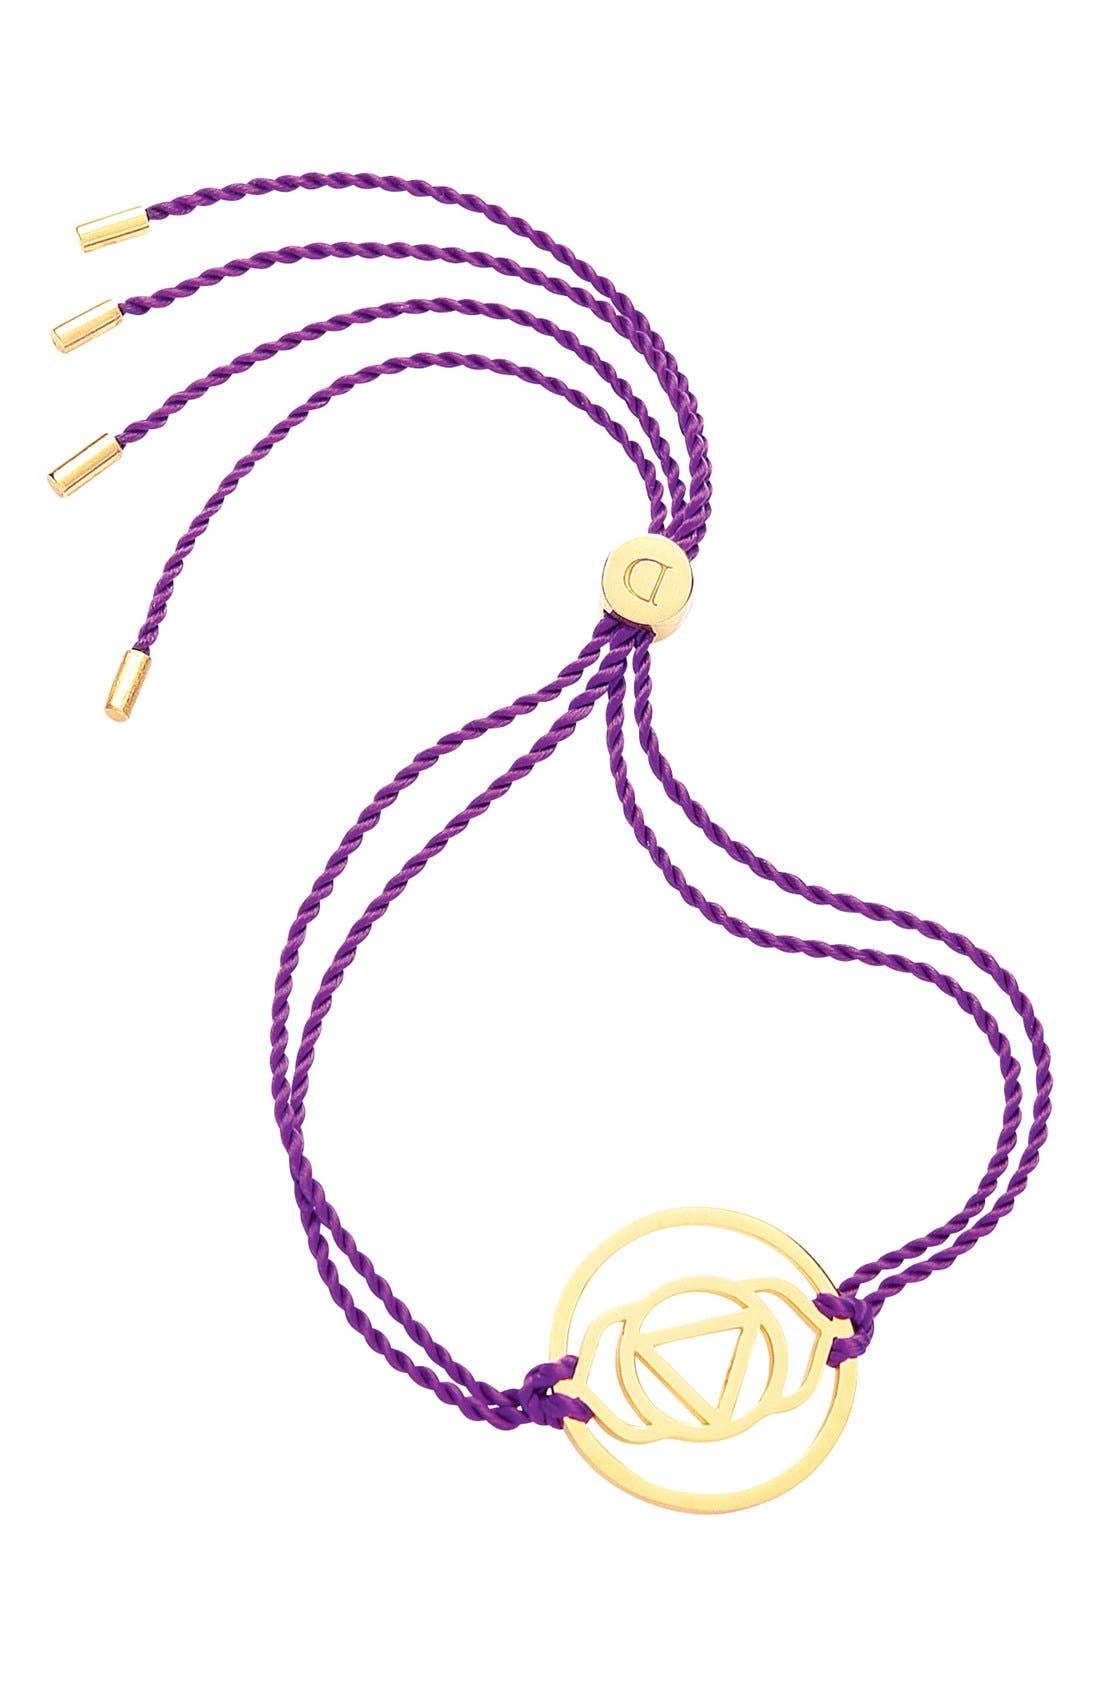 'Brow Chakra' Cord Bracelet,                         Main,                         color, 24Ct Gold Plate/Purple